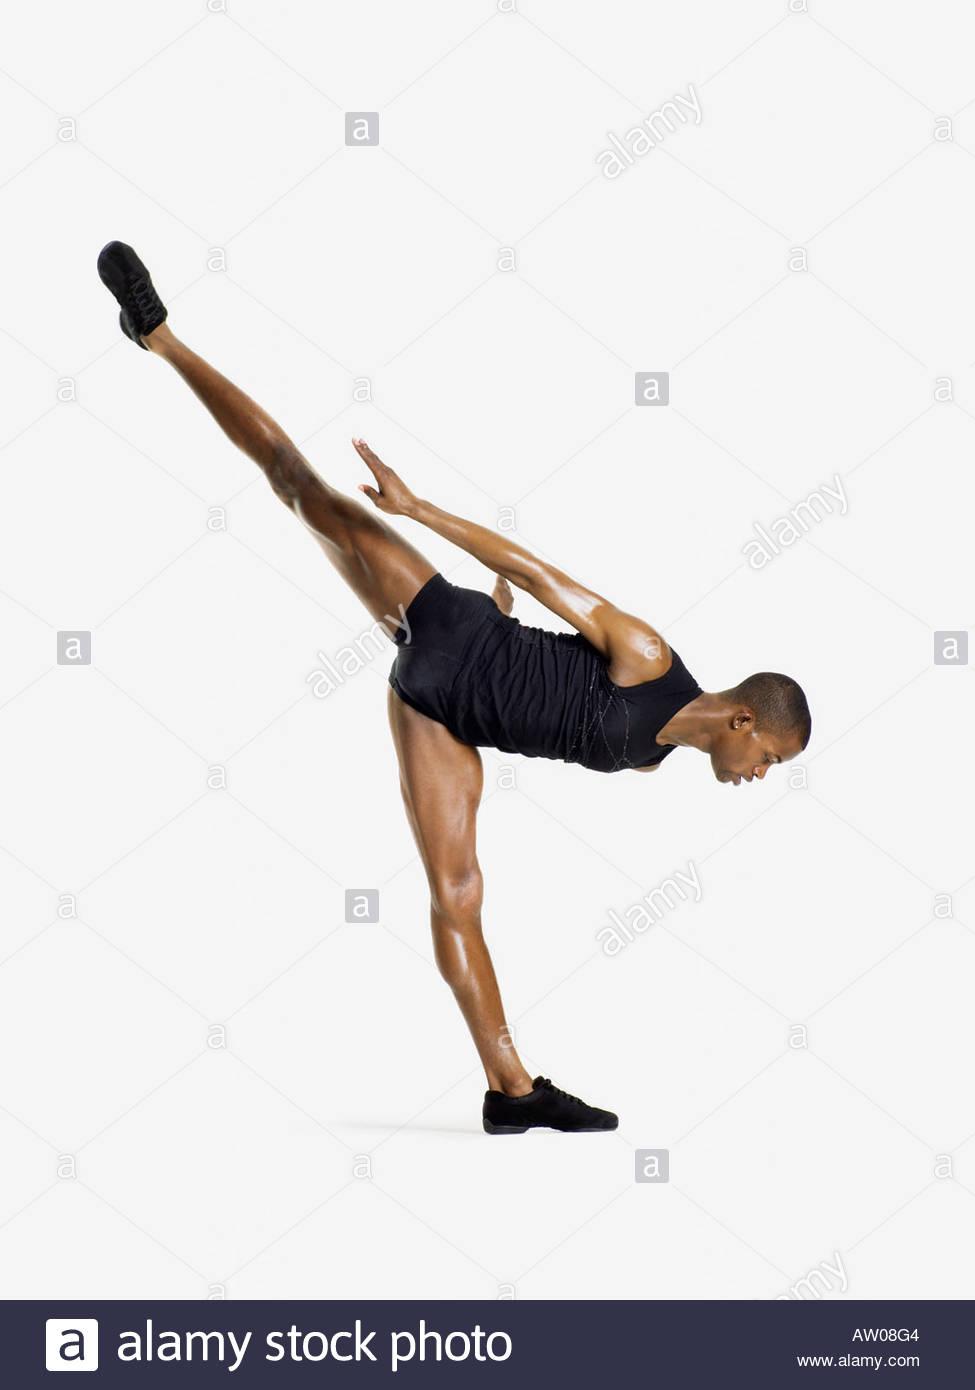 Male dancer on one leg - Stock Image